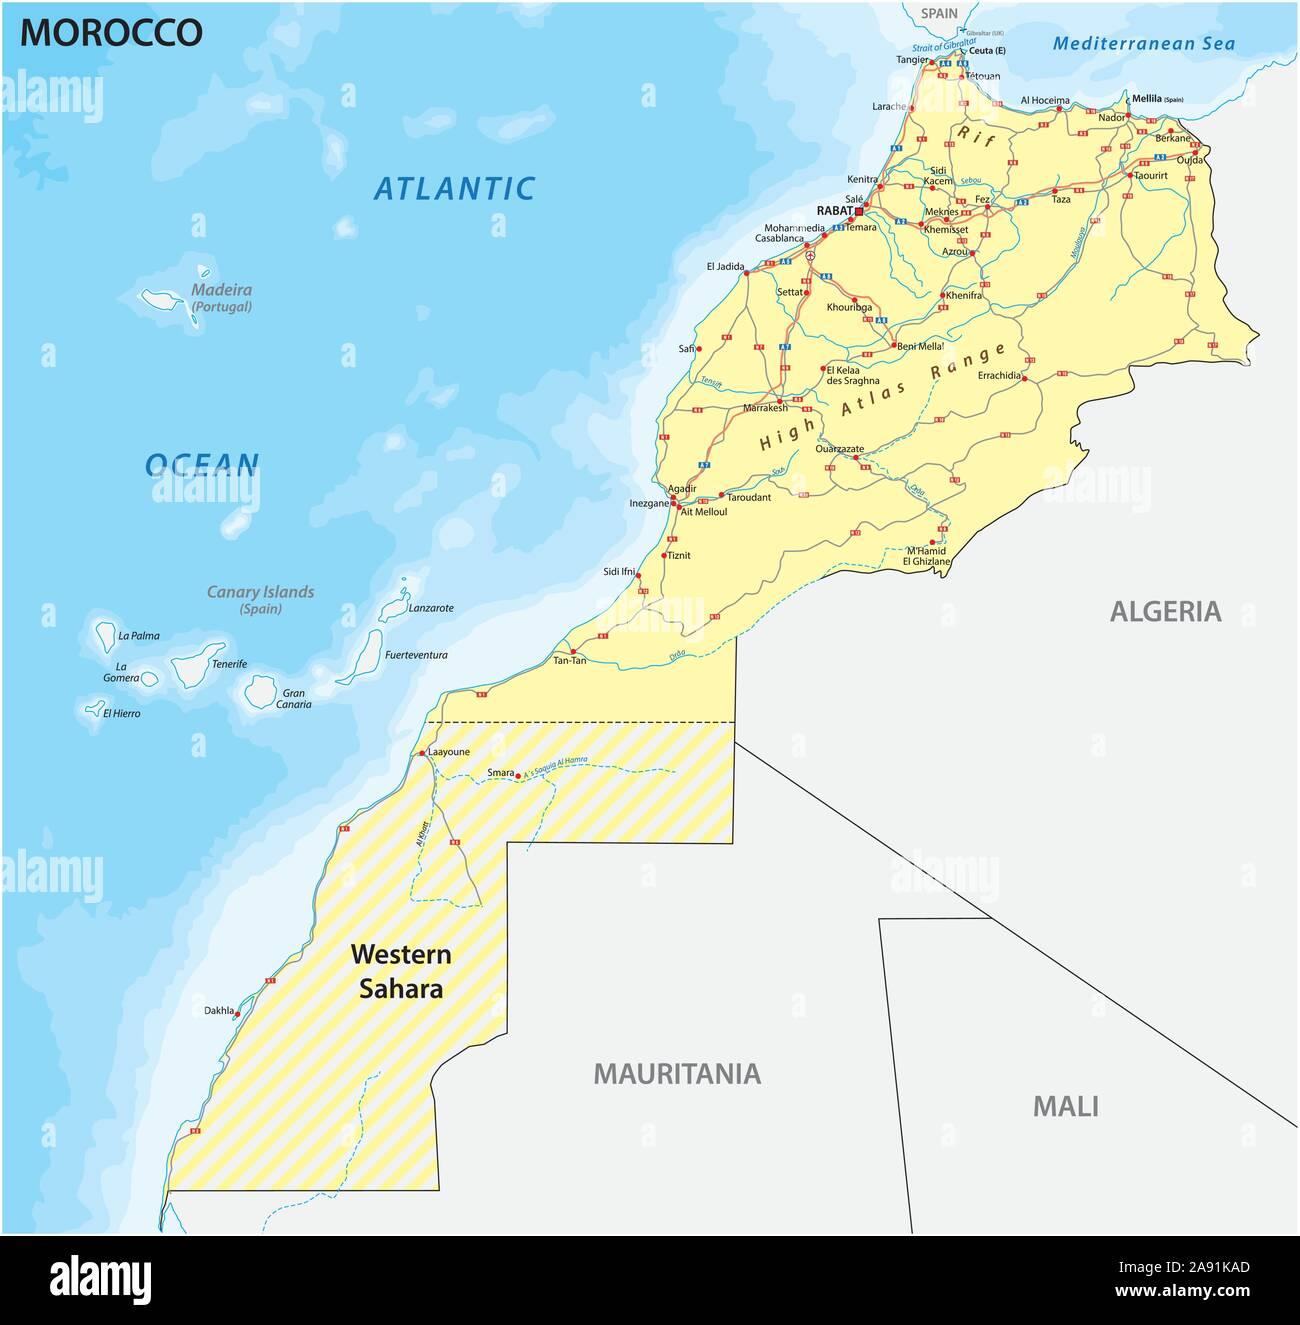 Marocco Cartina Geografica Fisica.Casablanca Morocco Map Immagini E Fotos Stock Alamy